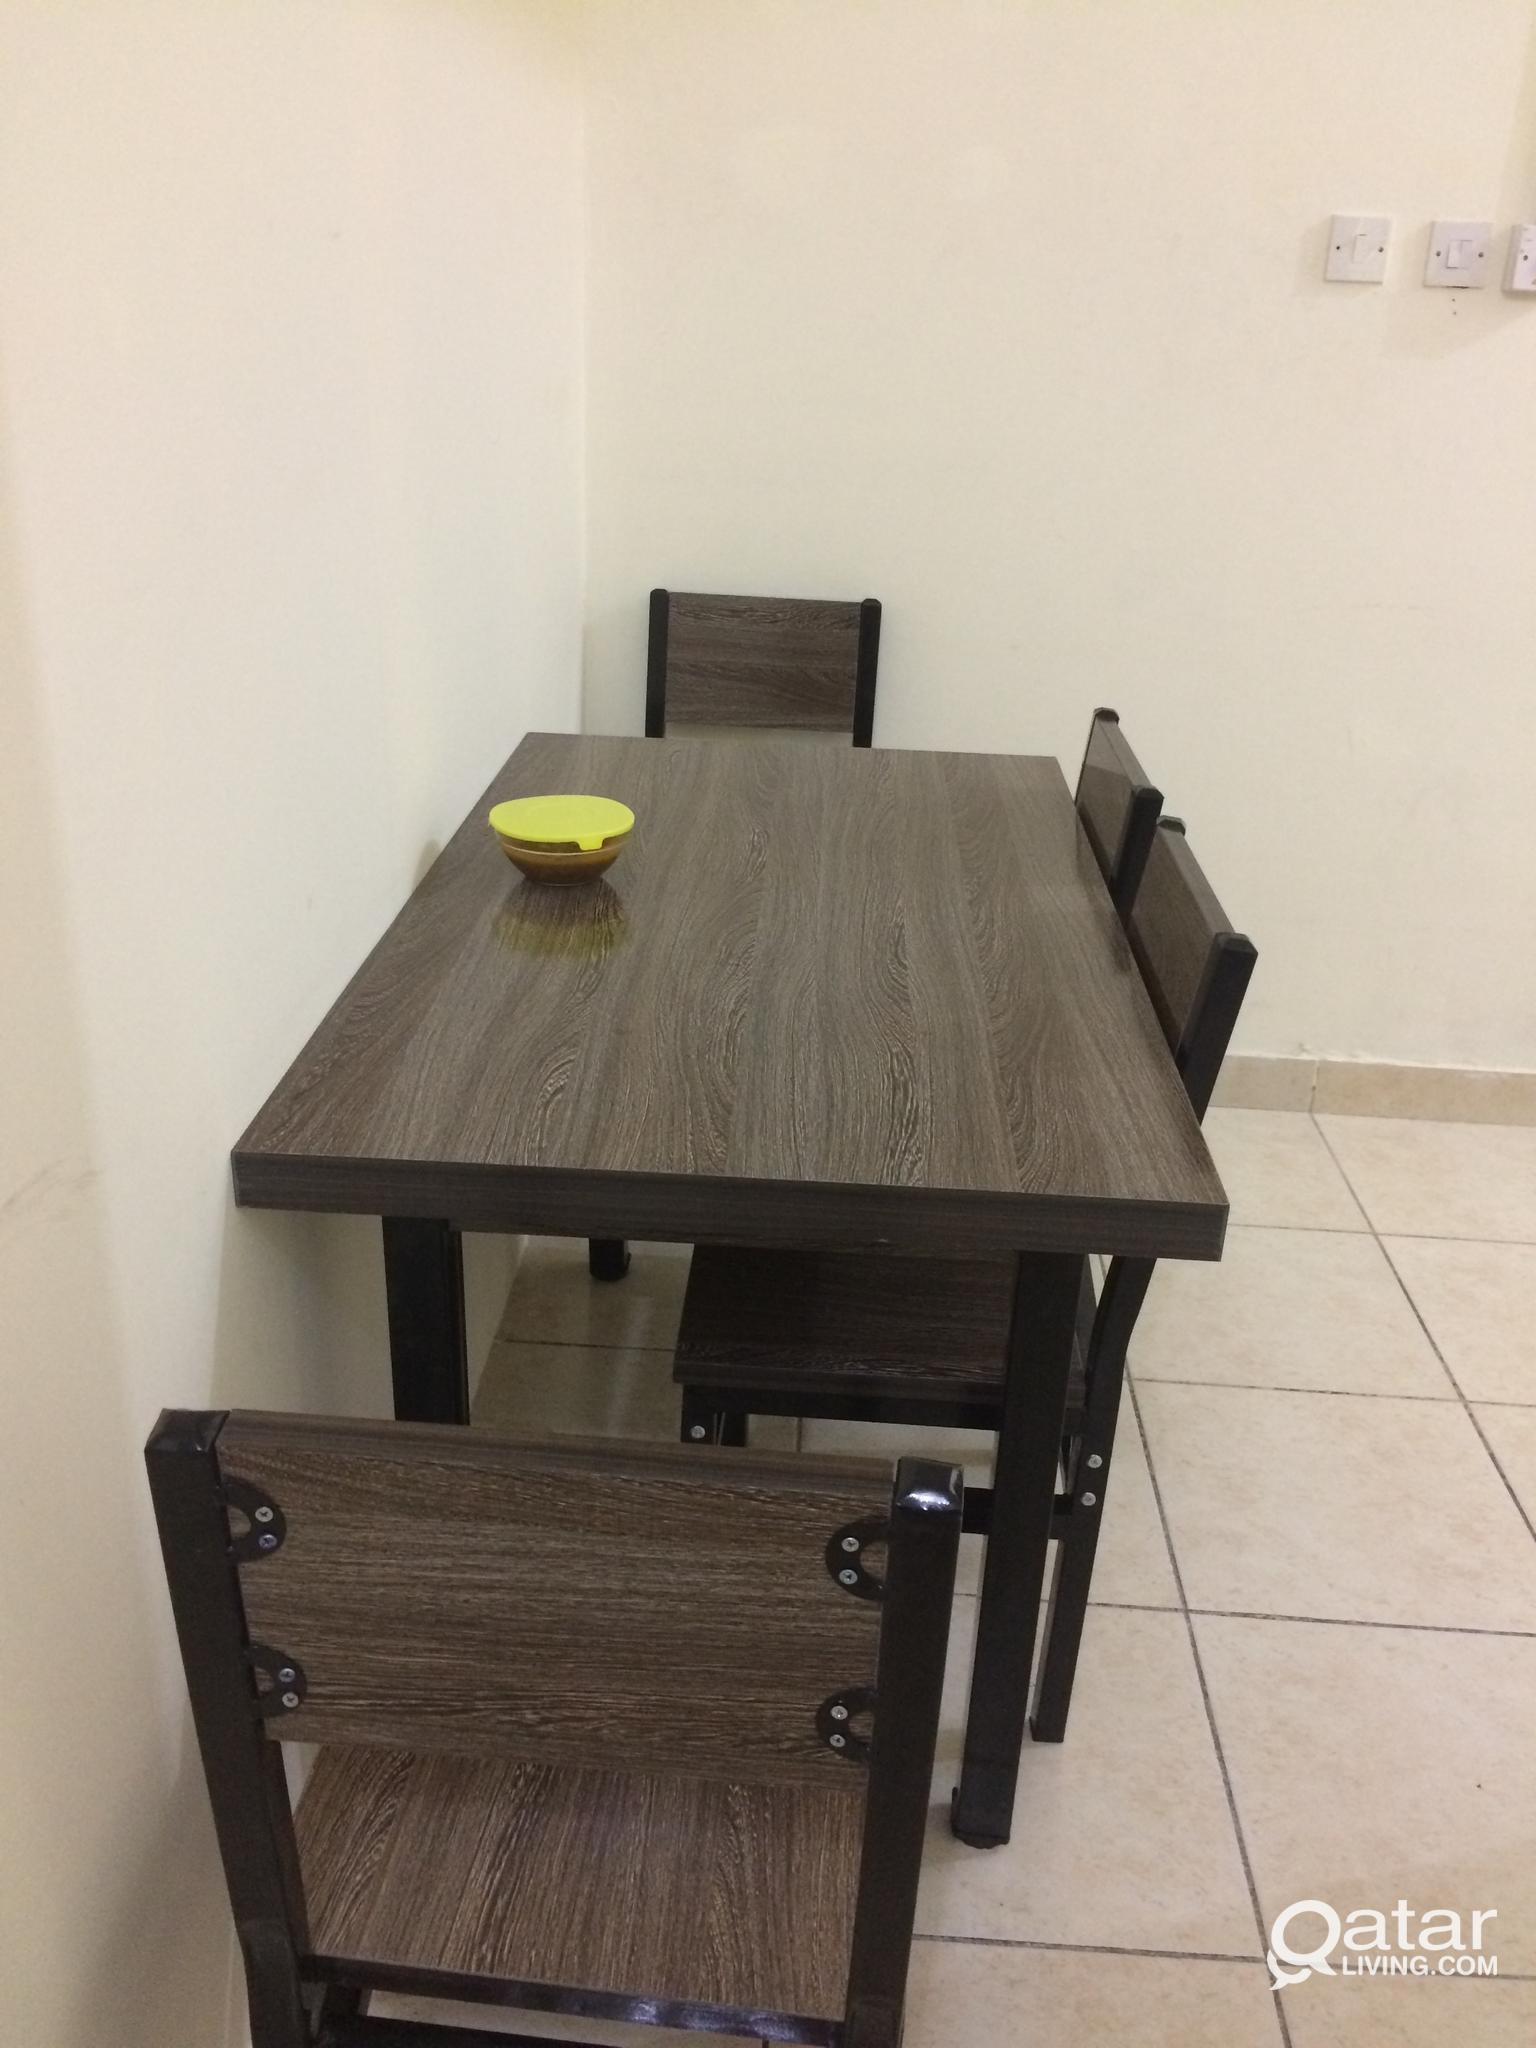 KABAYAN CONCRETE KWARTO READY TO OCCUPY-BIN MAHMOU